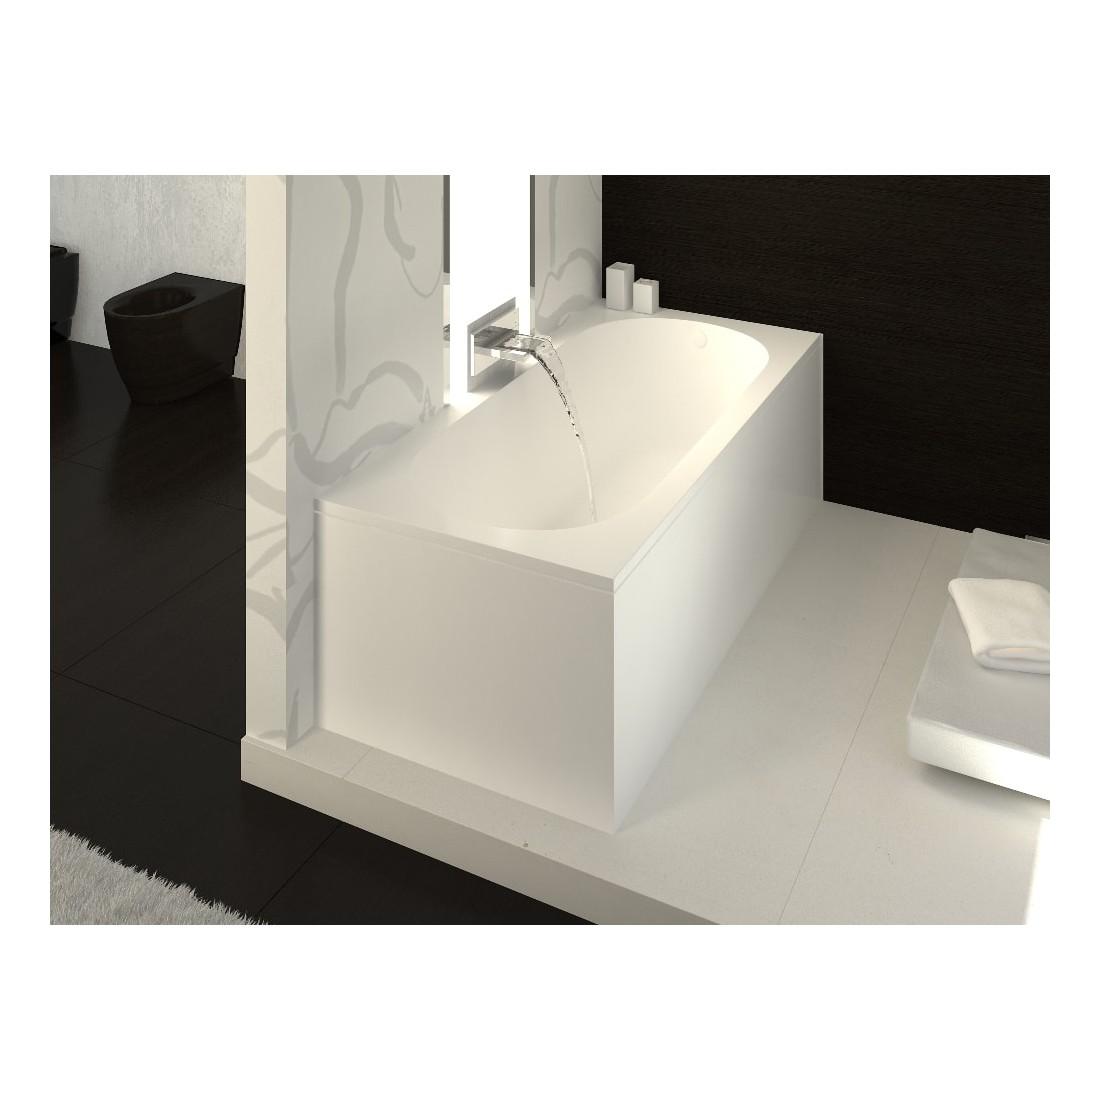 Akmens masės vonia Vispool Libero, 170x80